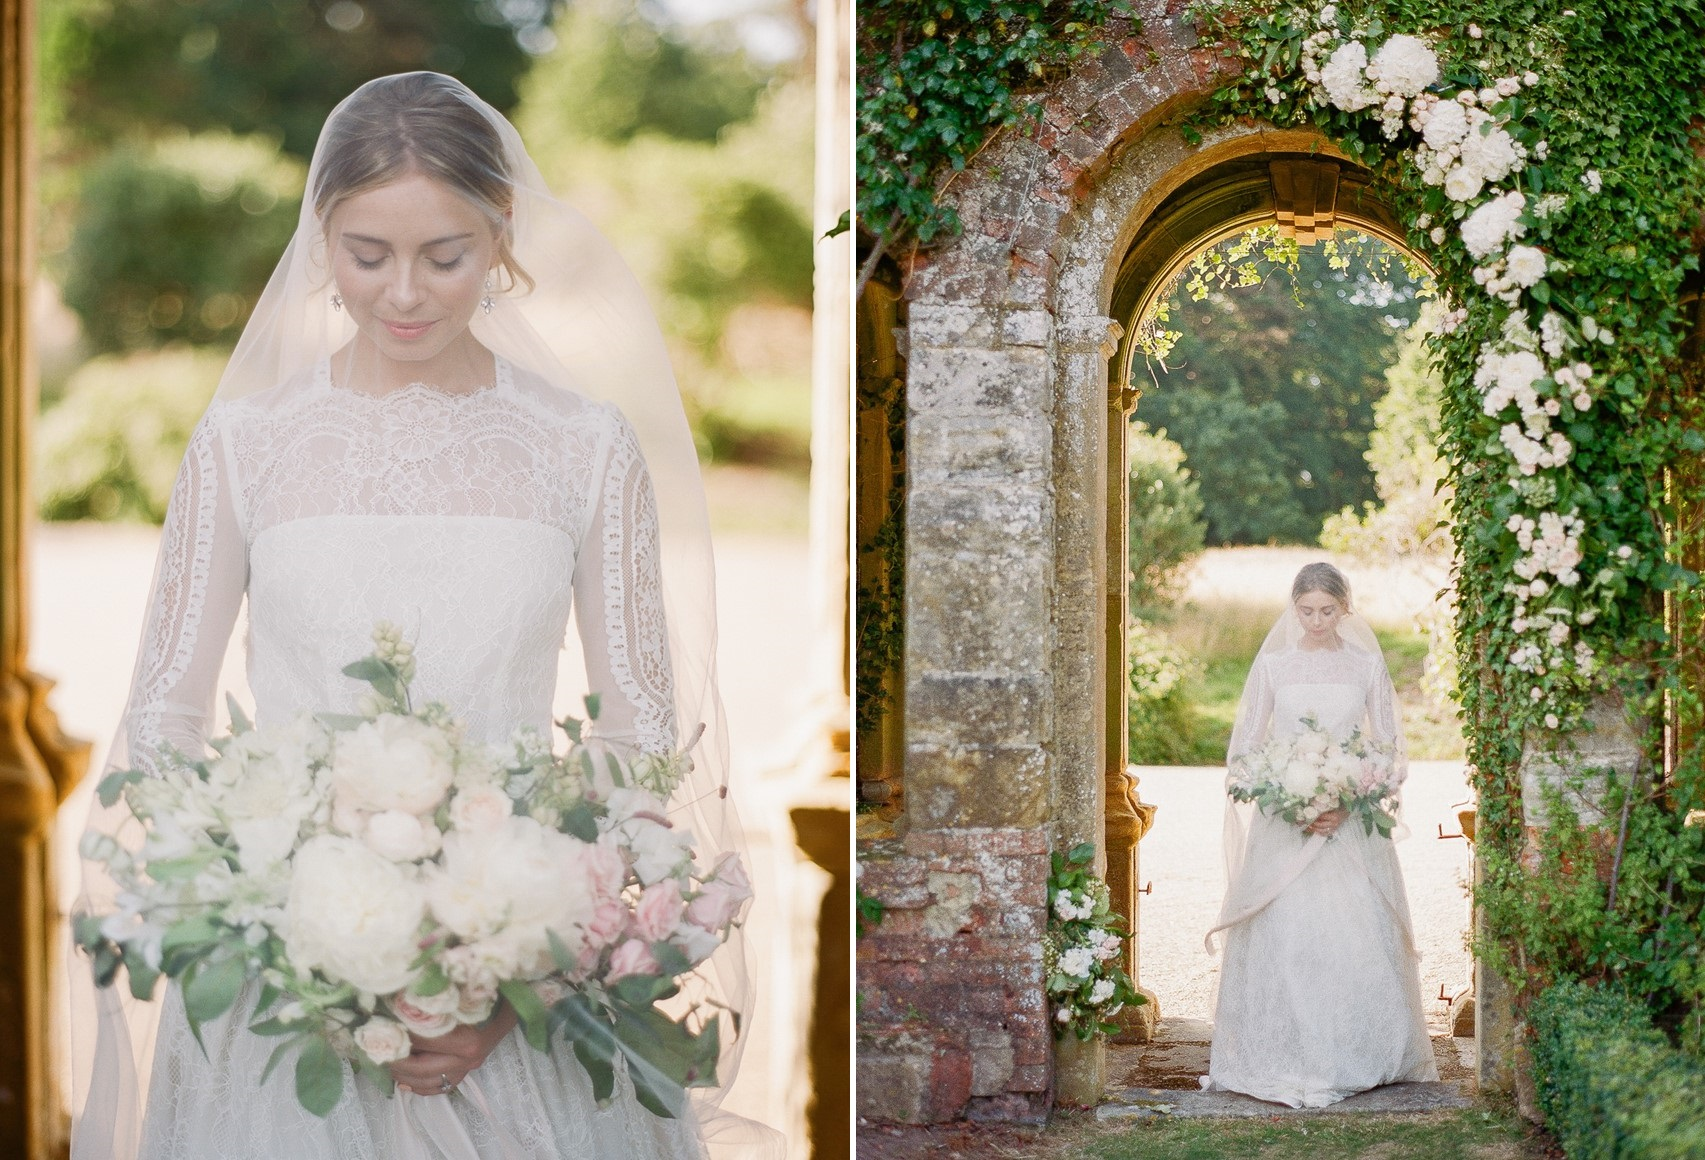 Bride in a Veil & Long Sleeve Wedding Dress